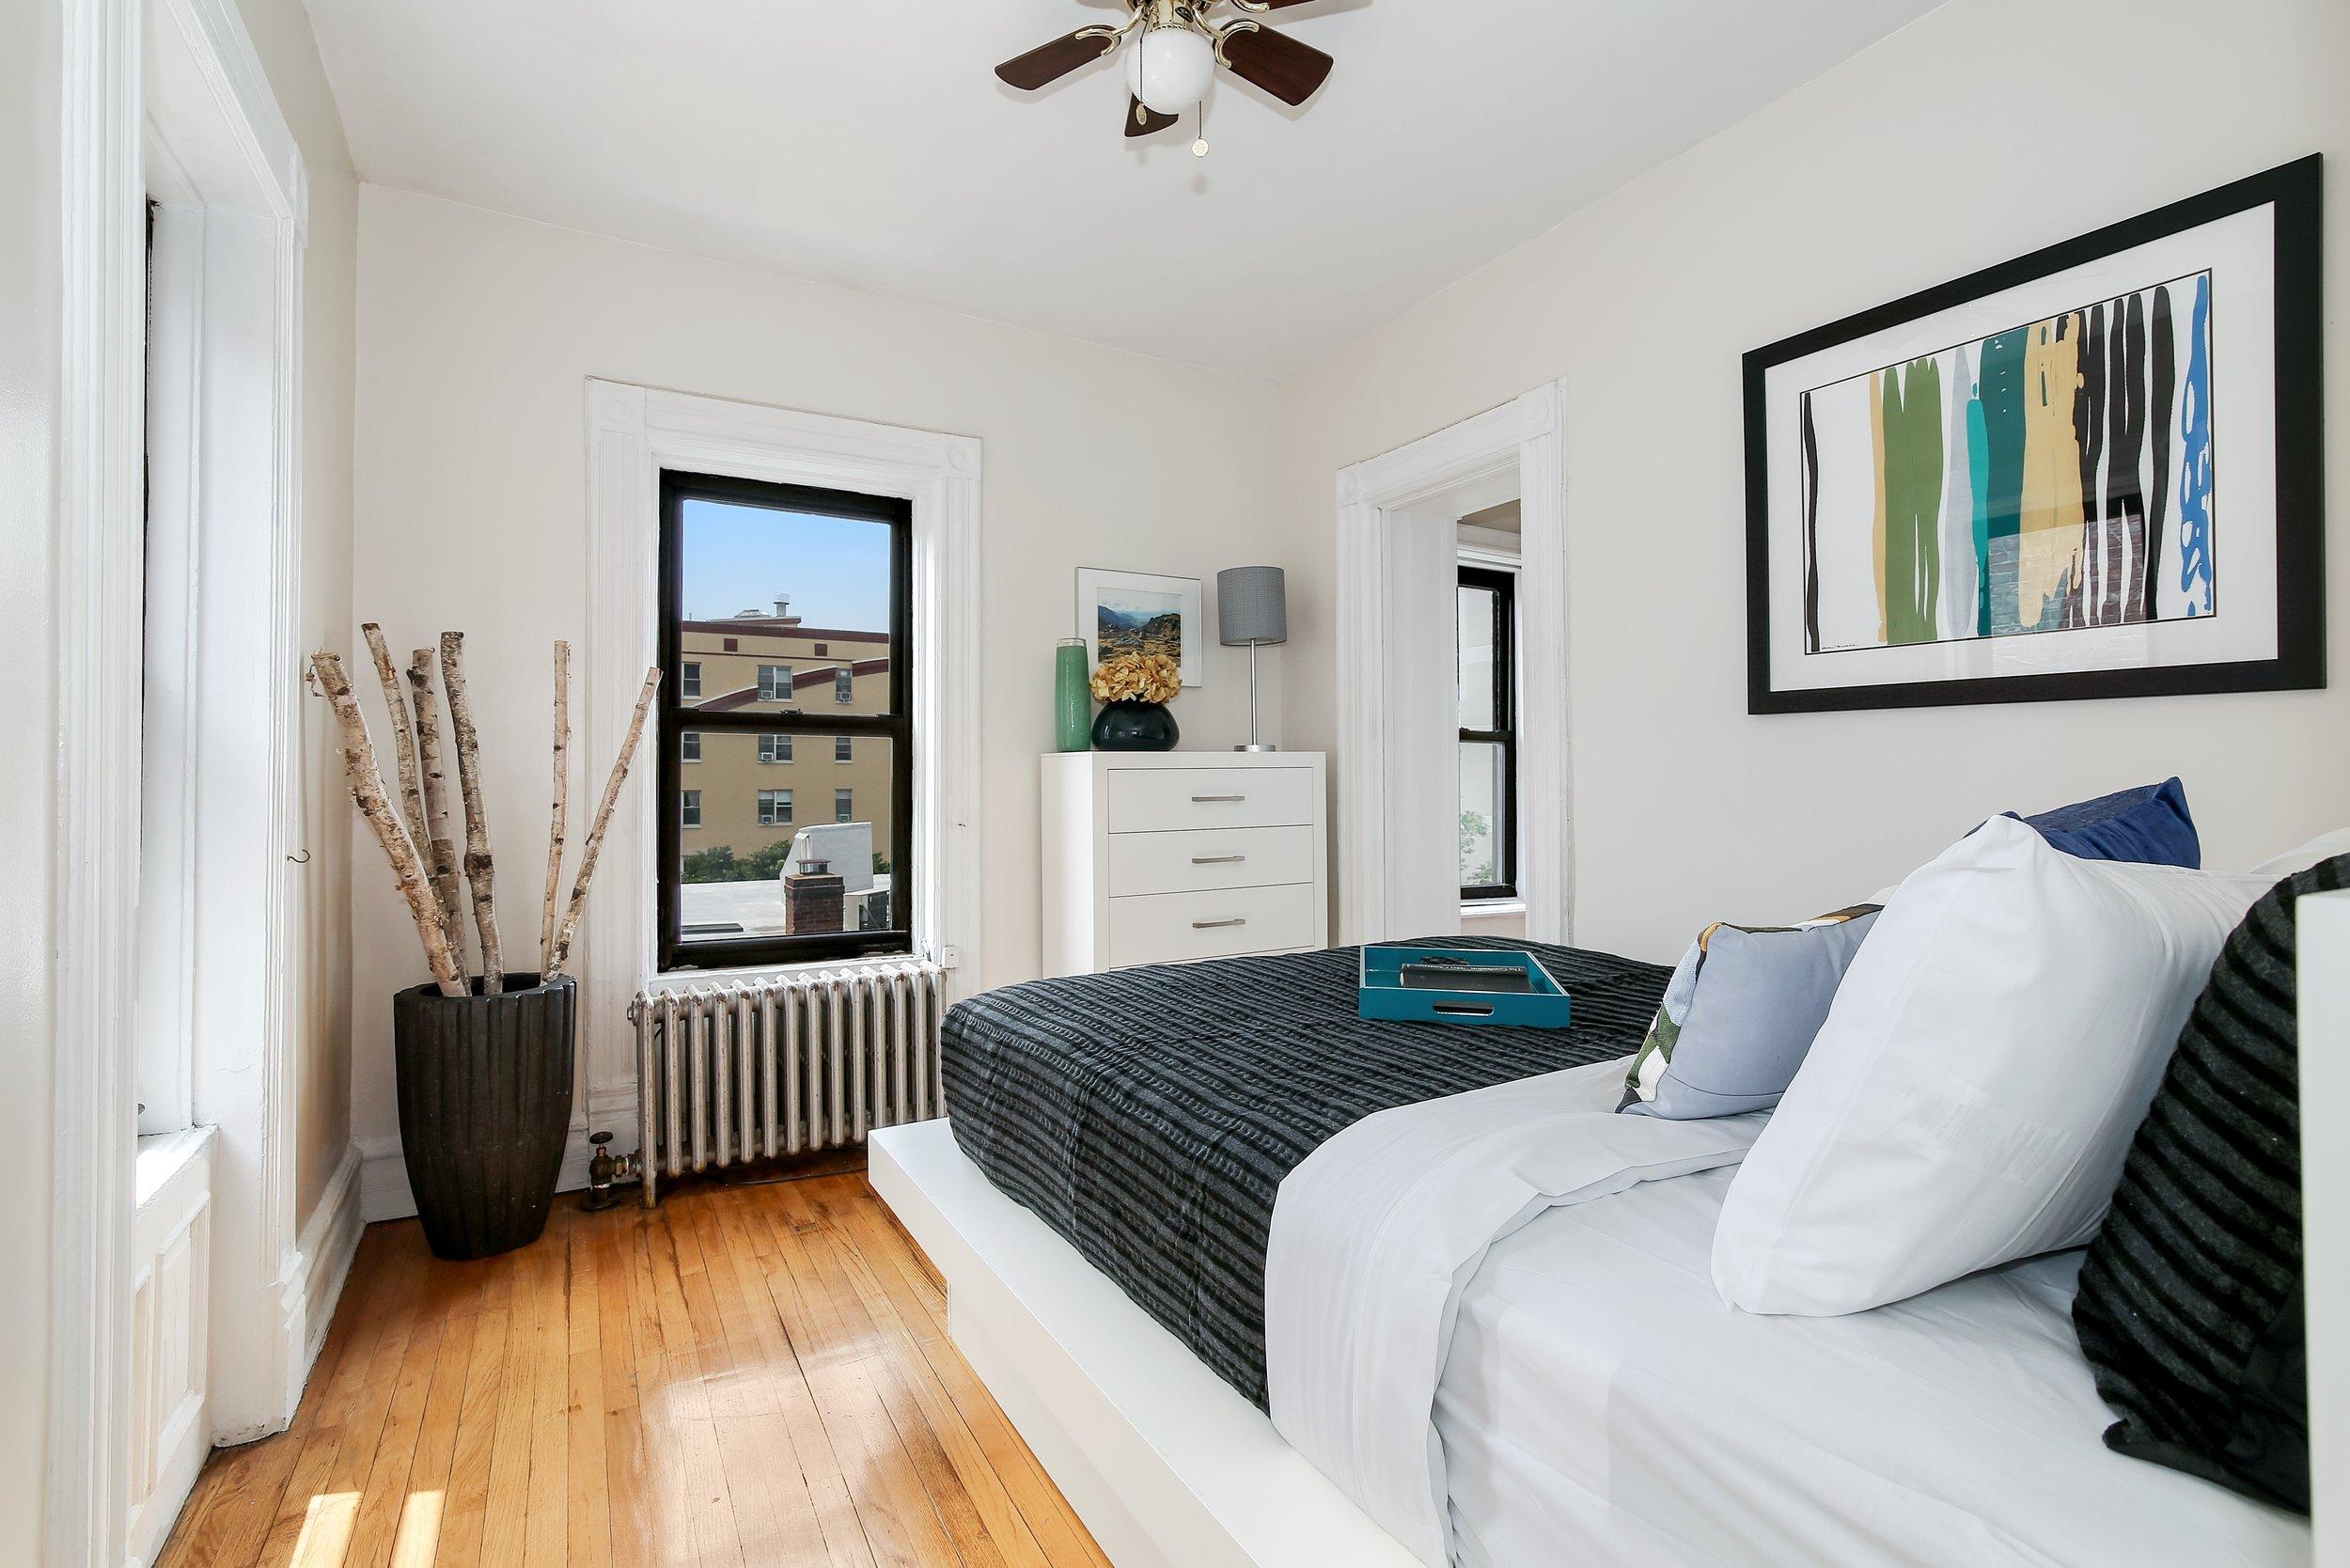 184 Clinton Ave Bedroom.jpg